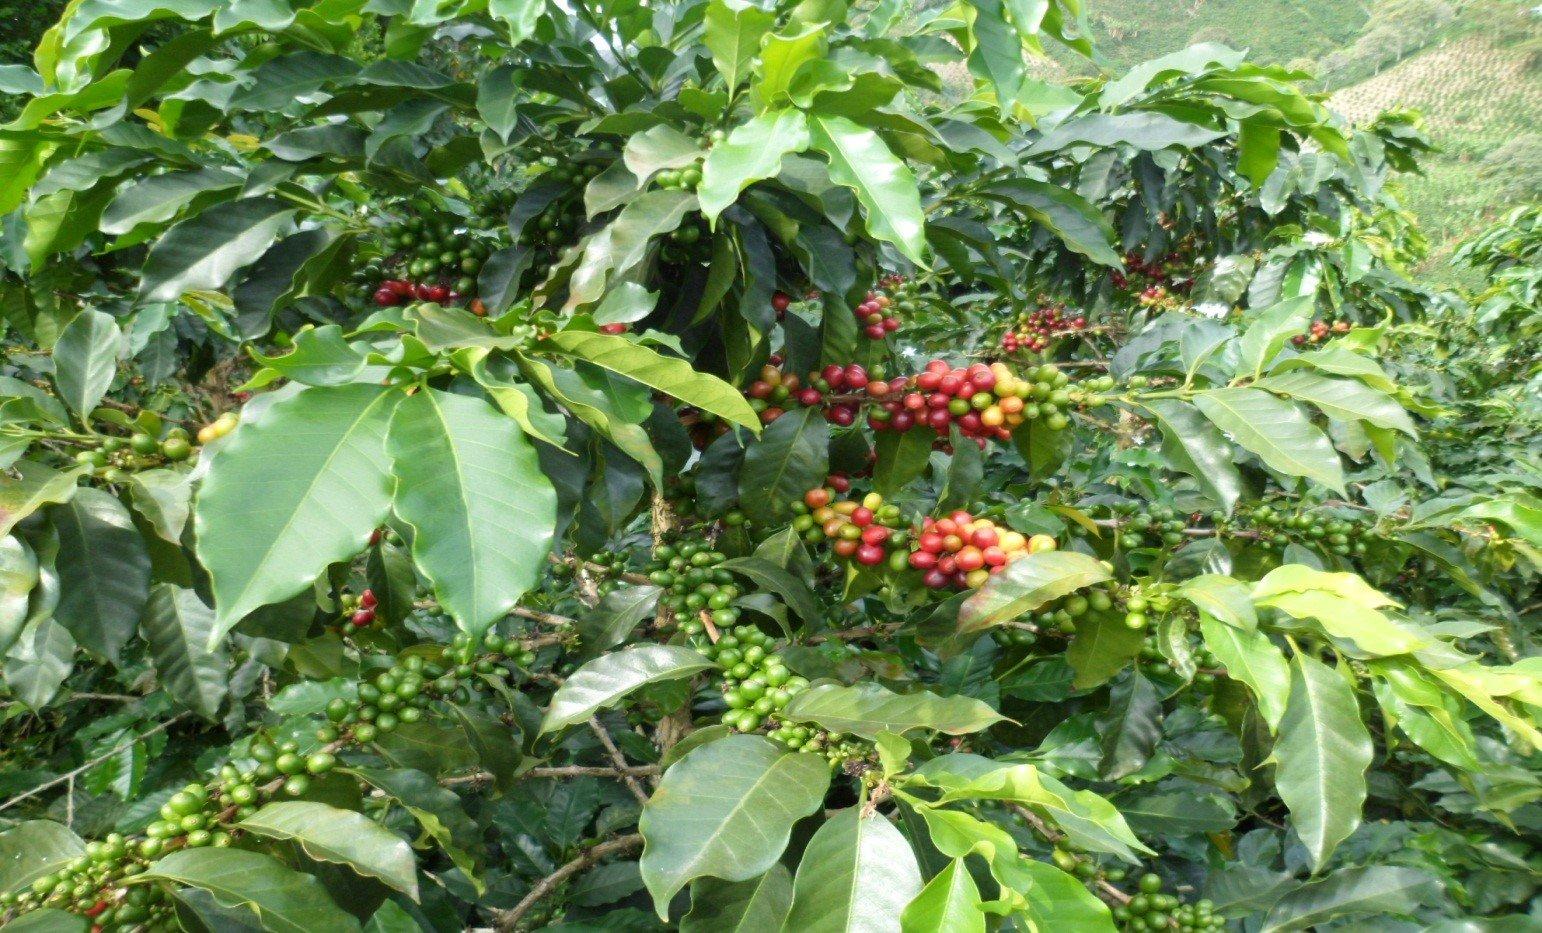 Unroasted Coffee Beans 3 Lb - 100% Colombian Coffee Beans - Green Coffee Beans -Single Origin- Farm La Beatulia